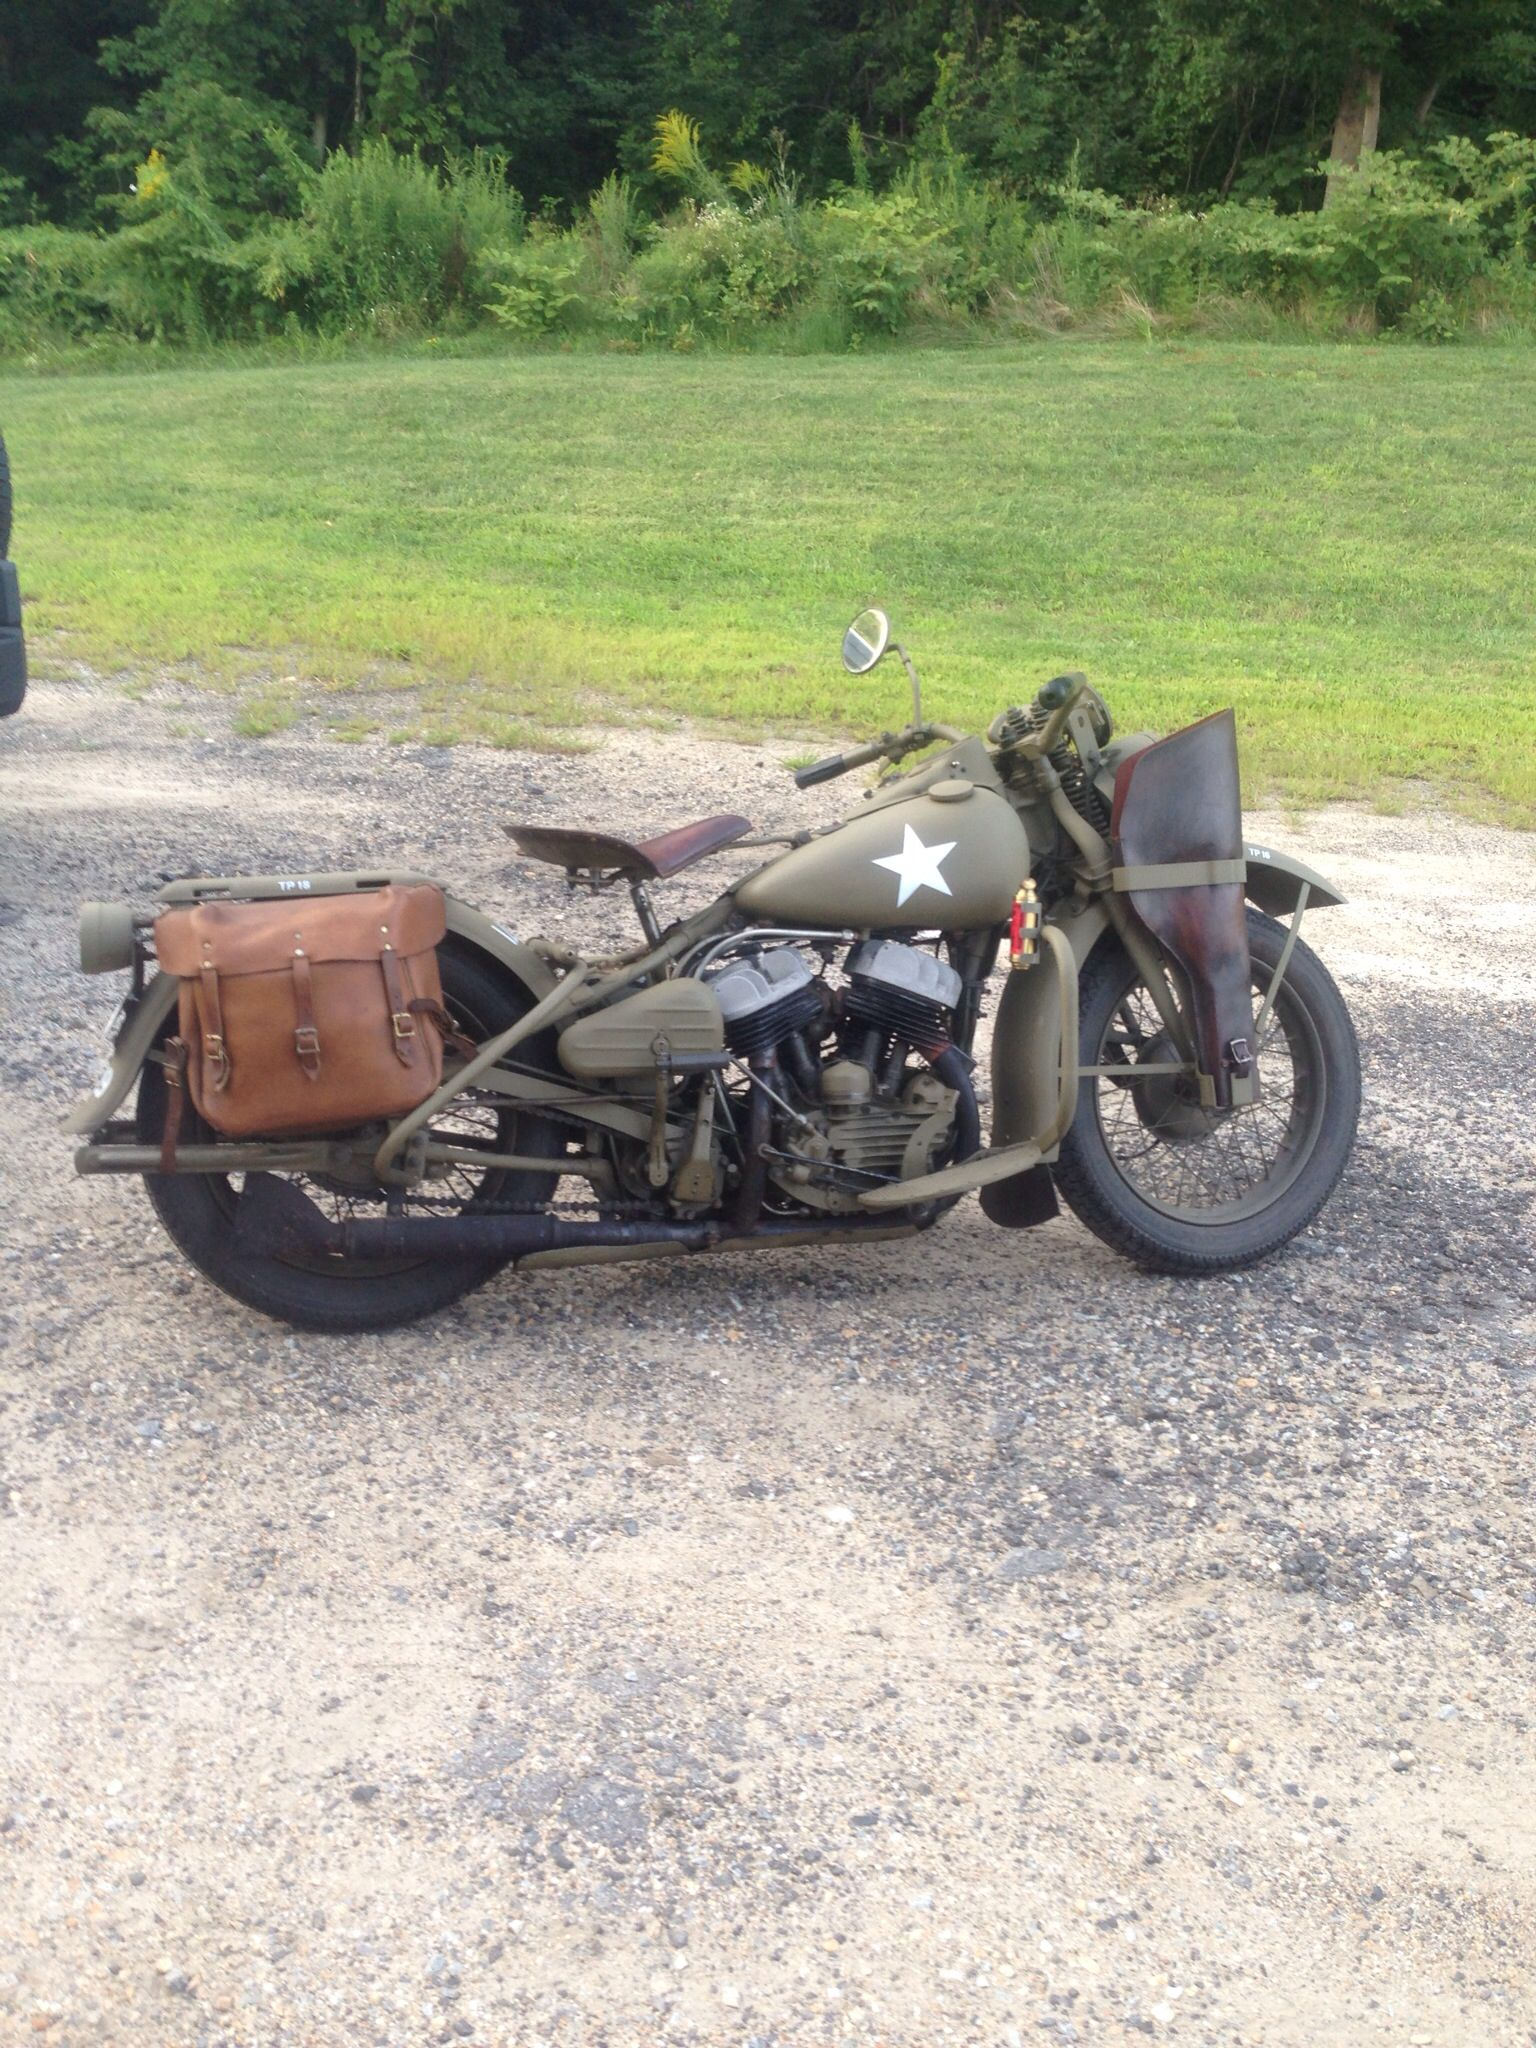 1942 Original Harley Davidson Army Bike Army Motorcycle Harley Davidson Engines Harley Davidson Wla